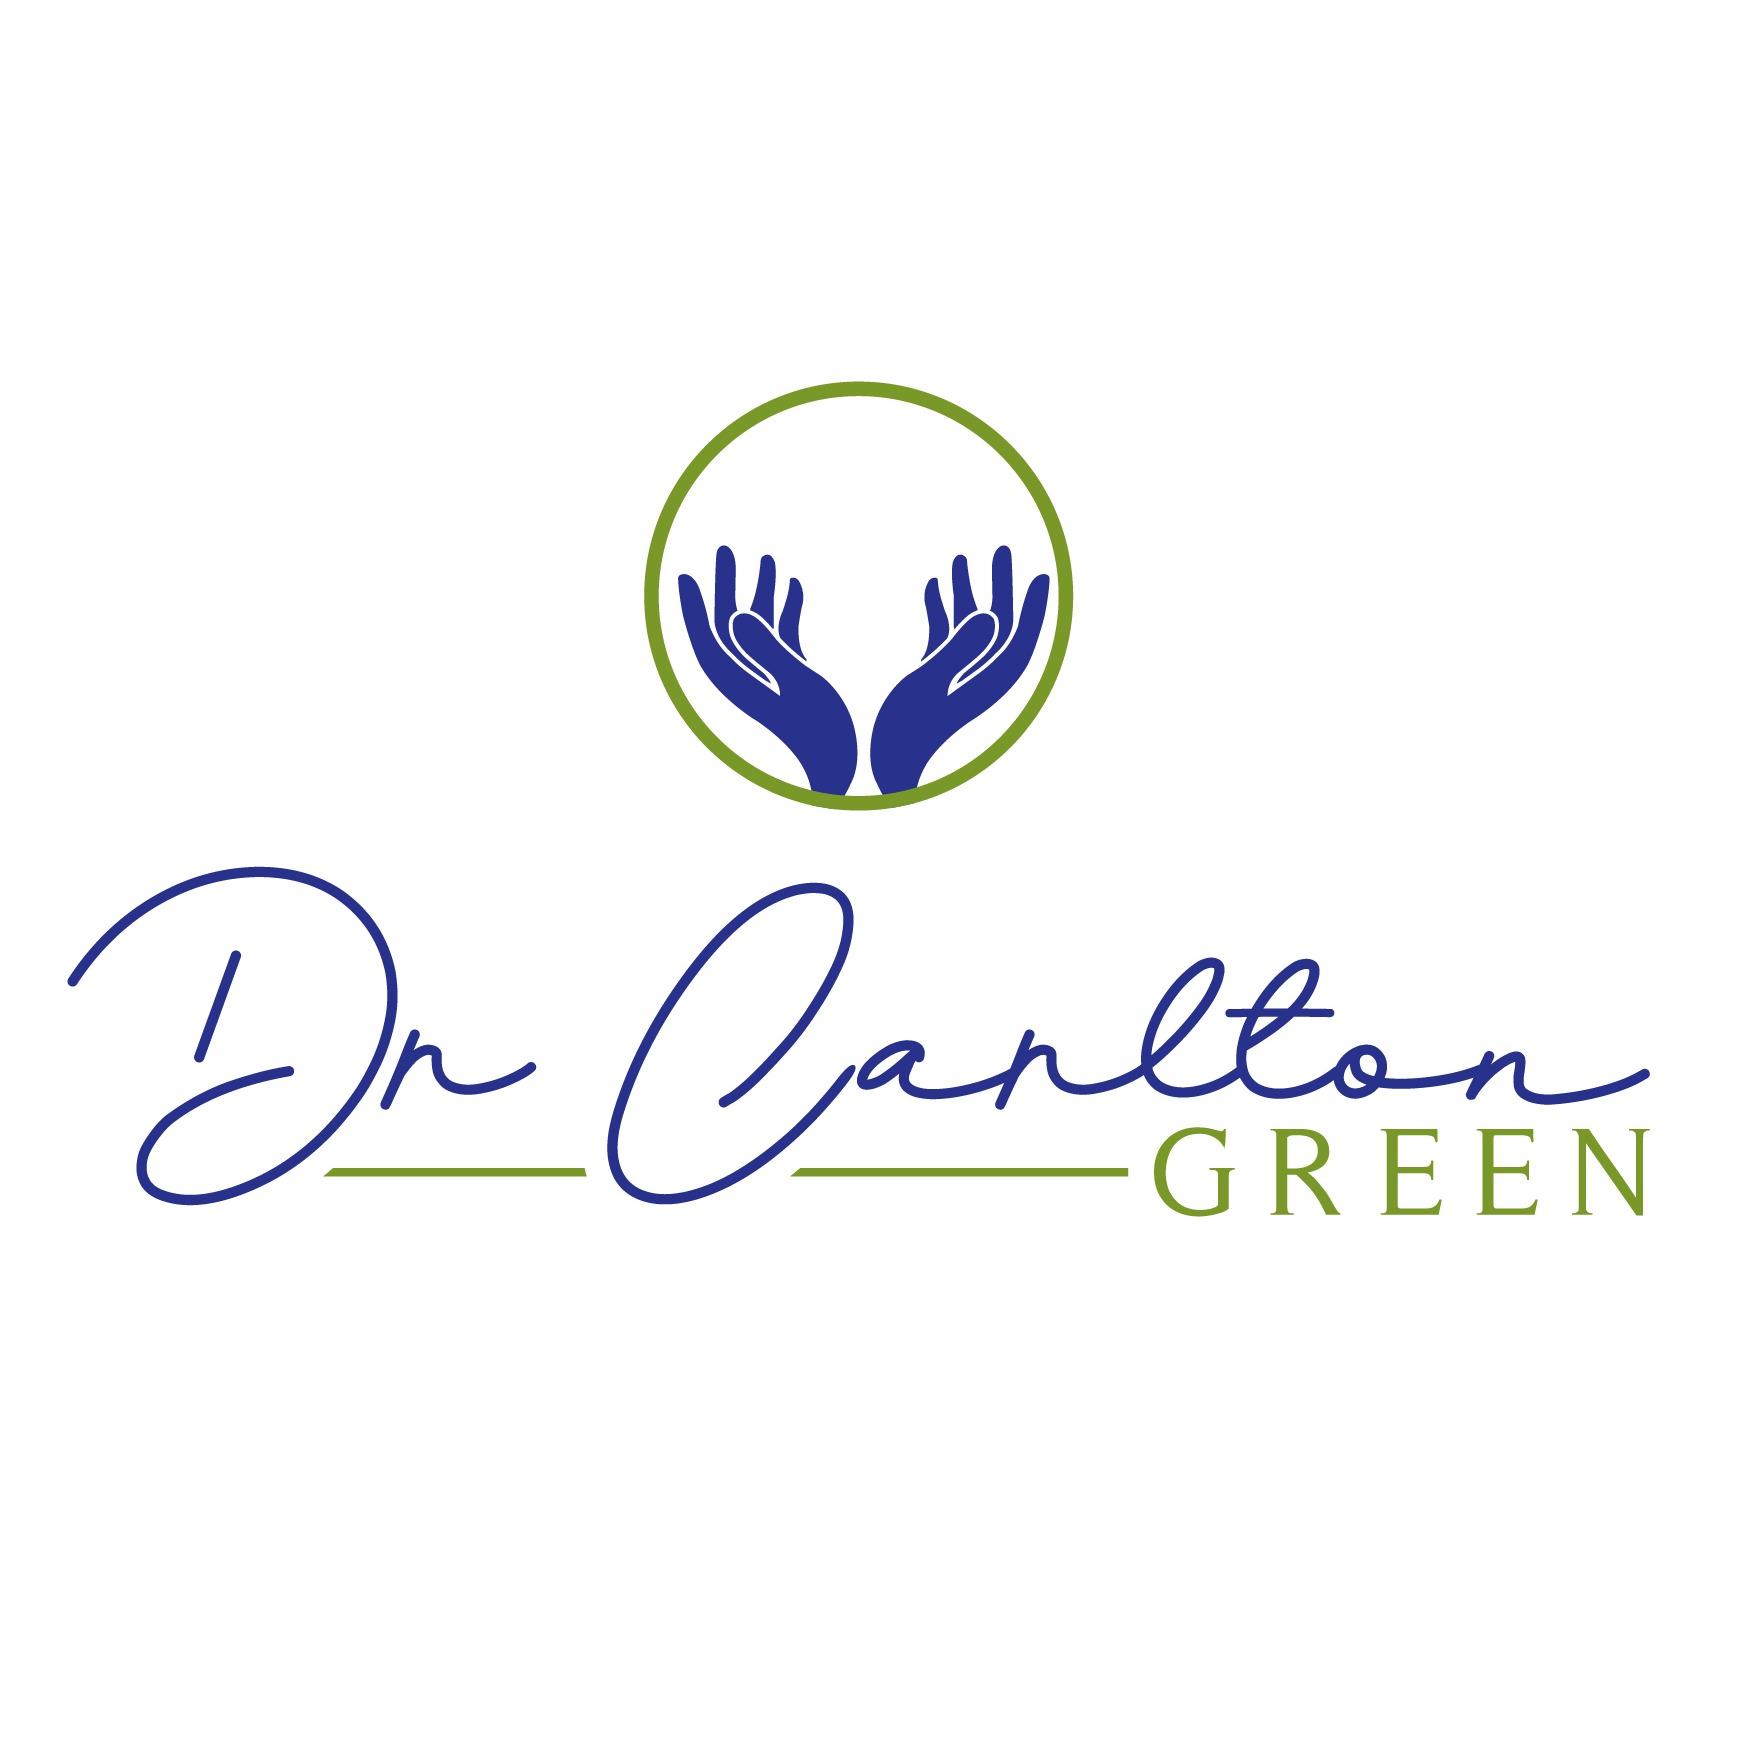 @carlton.green Profile Image | Linktree